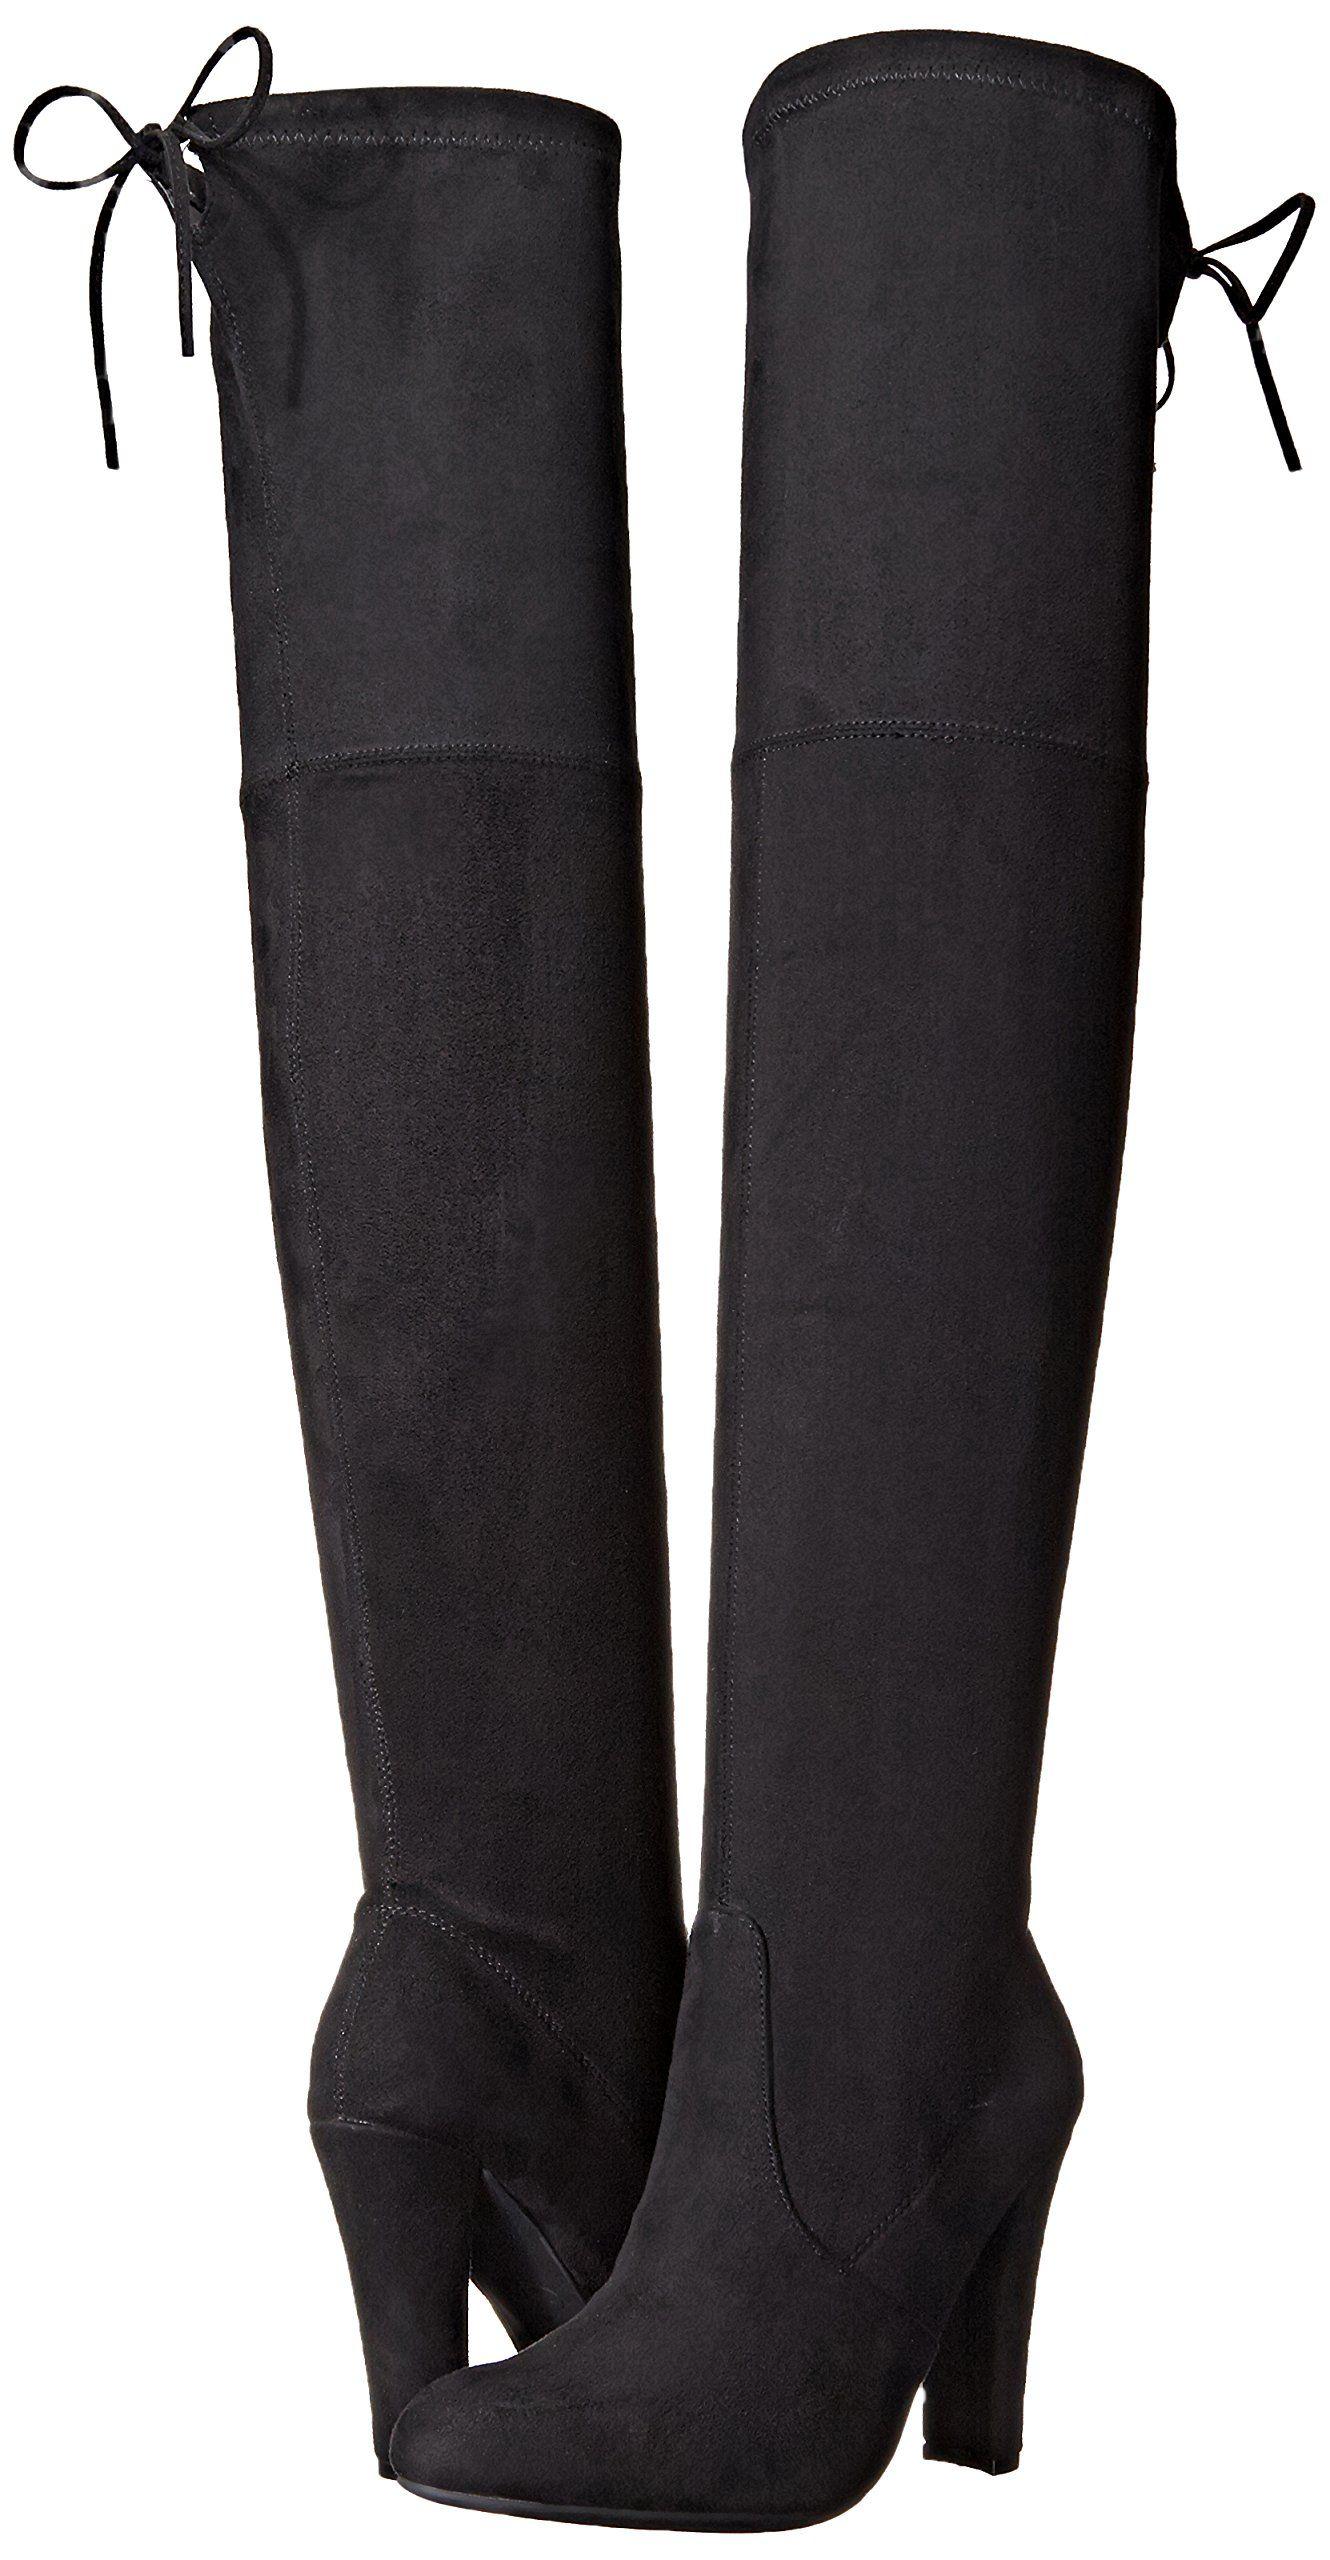 4c6f7c0cf3a Amazon.com  Steve Madden Women s Gorgeous Winter Boot  Clothing ...